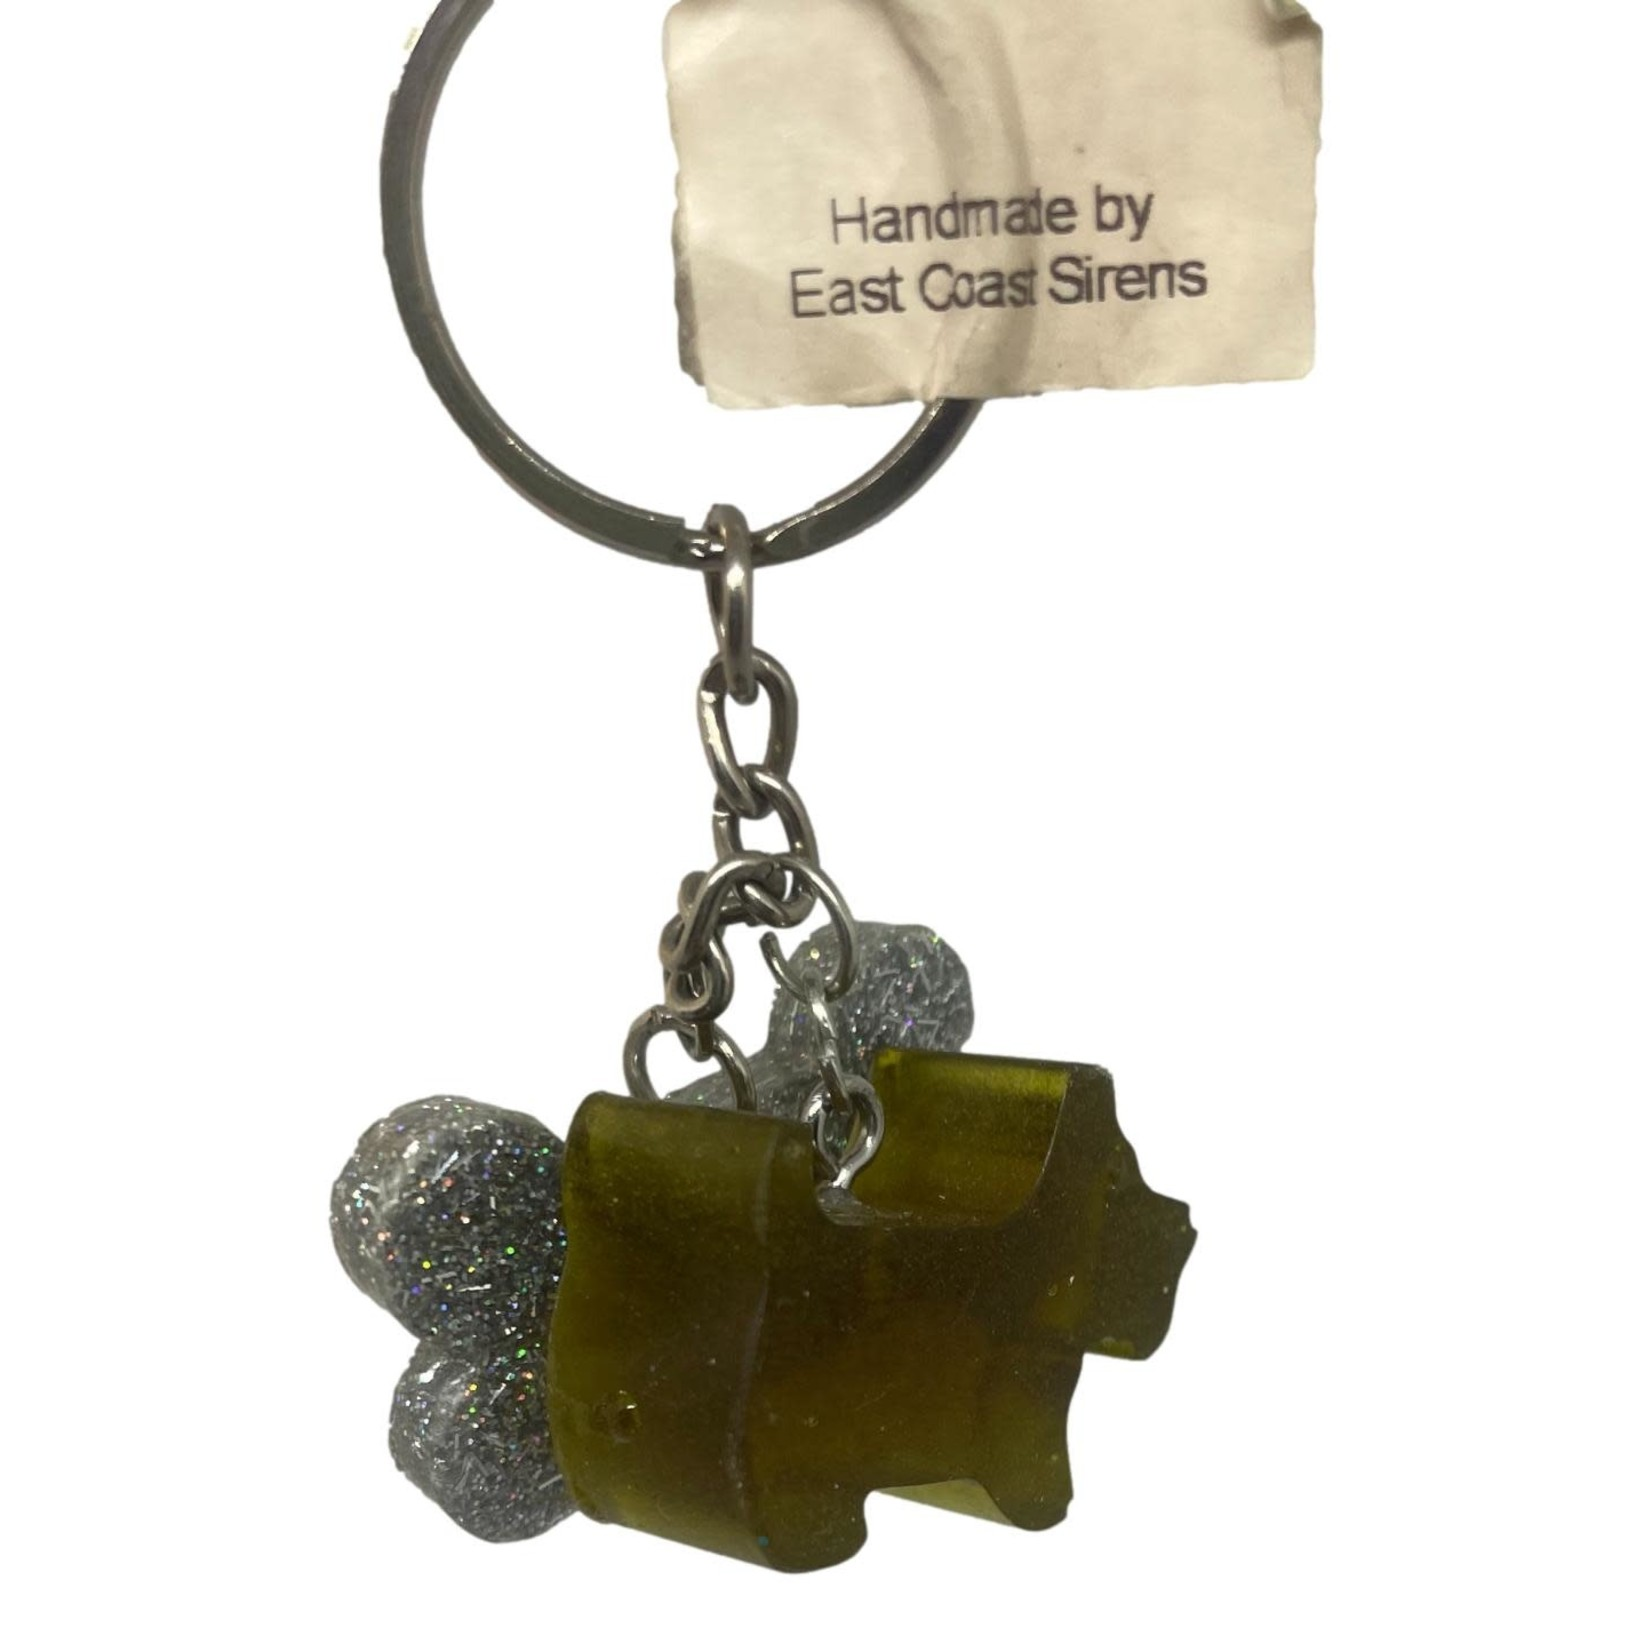 East Coast Sirens Dog & Bone Keychain